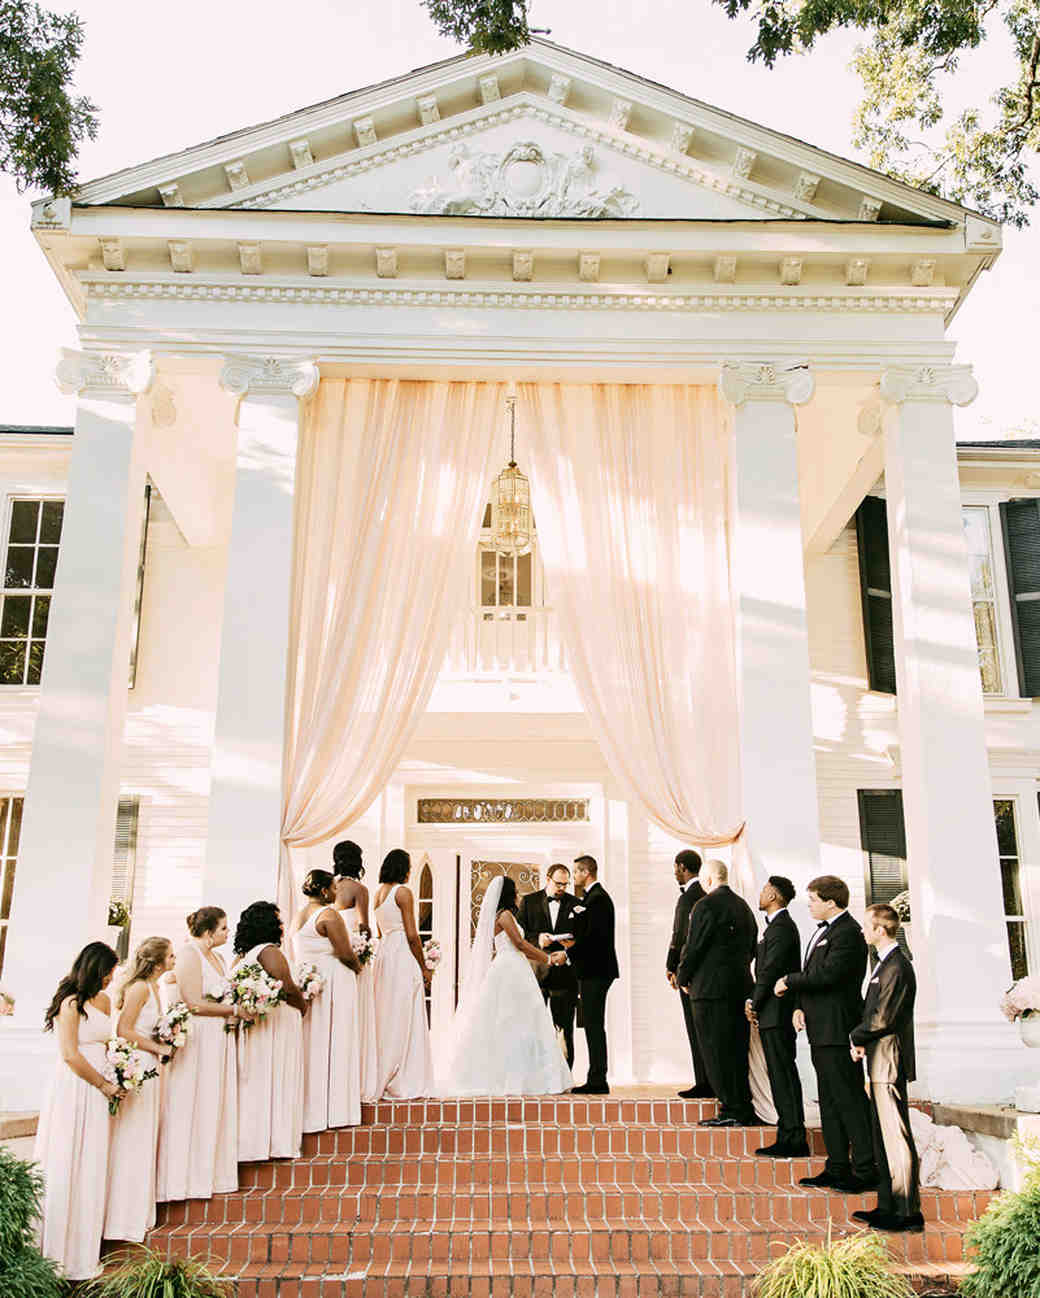 wedding ceremony on porch of mansion